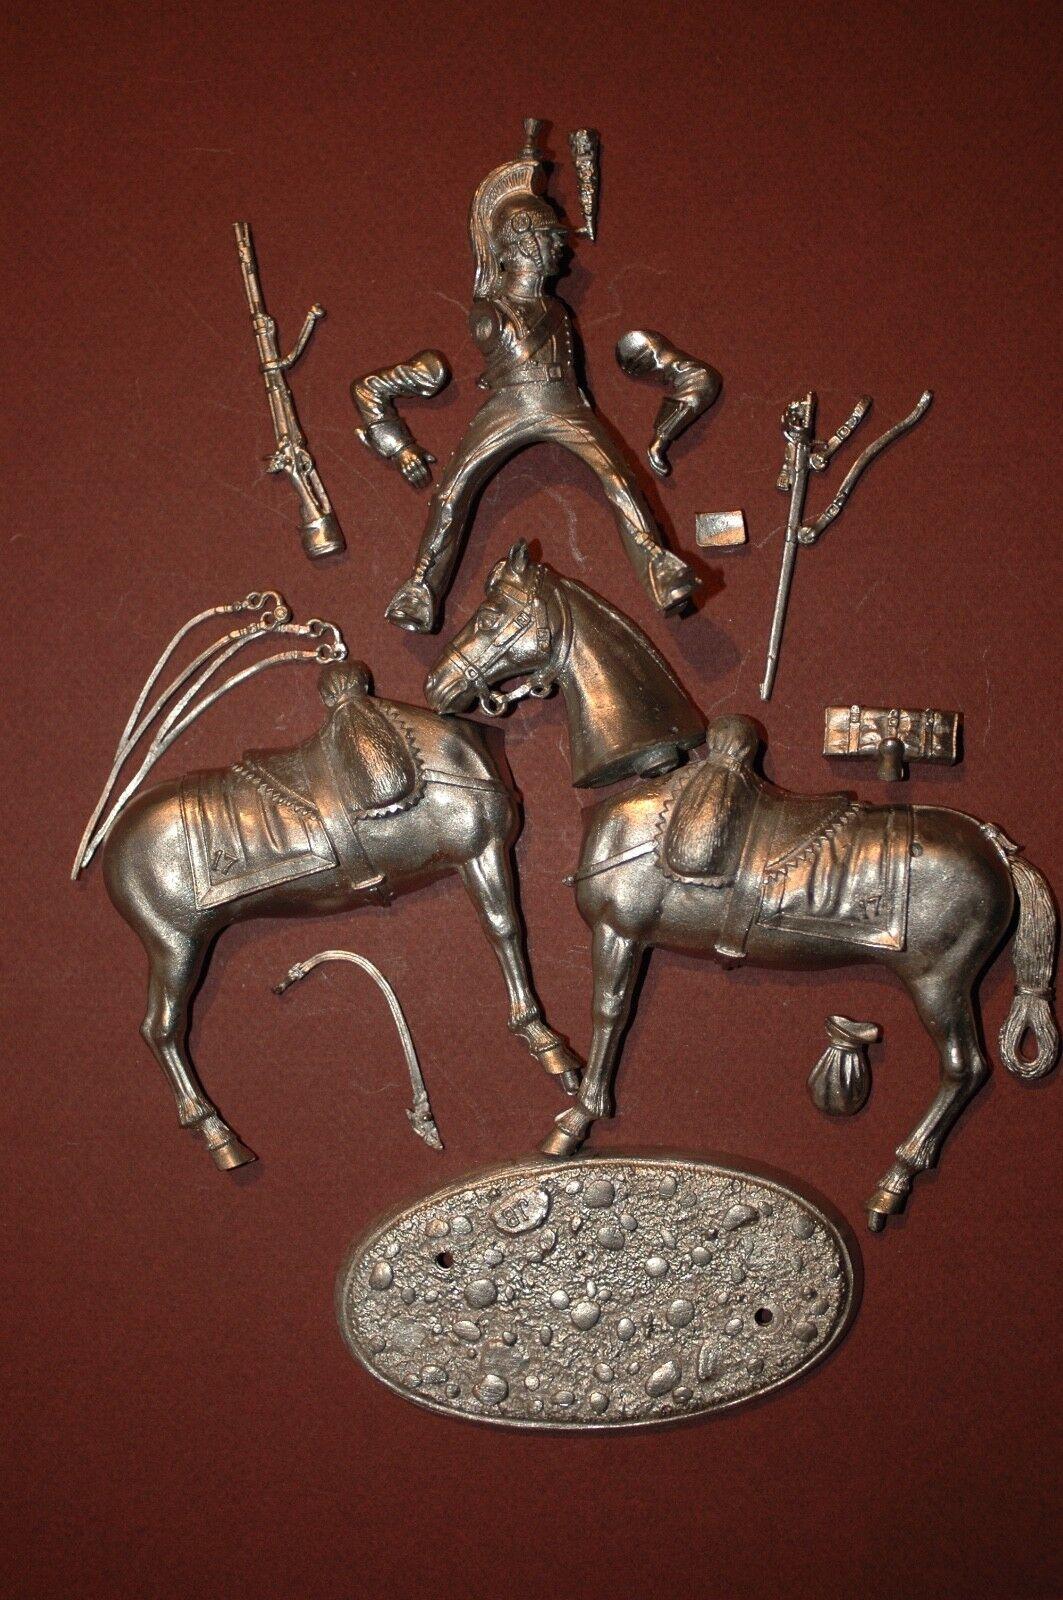 Sehr selten benassi 80 mm dragon de la ligne beitrag regiment 1812-1814